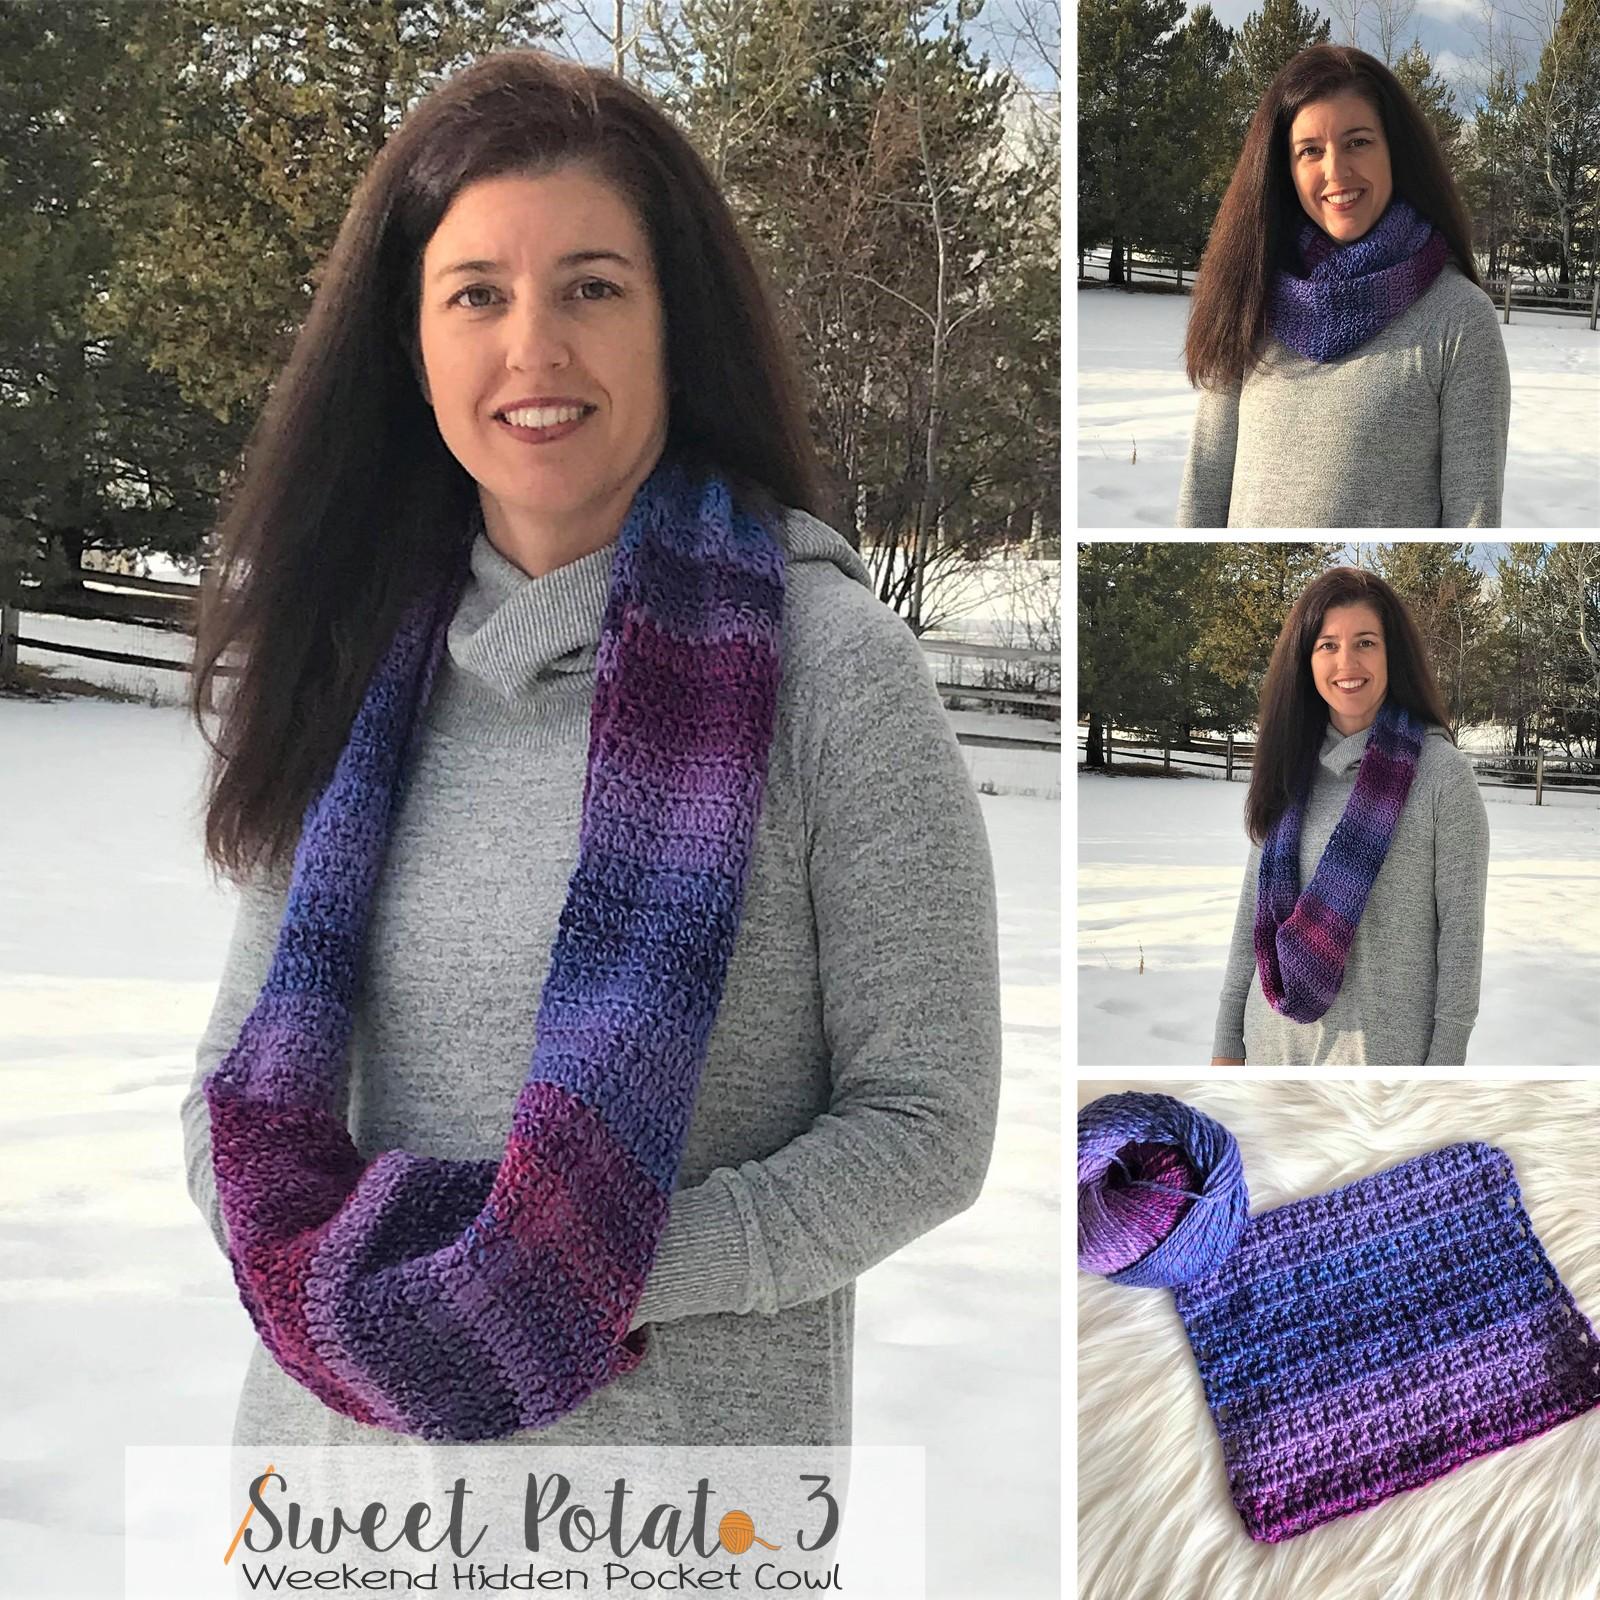 Weekend Hidden Pocket Cowl – Crochet Pattern